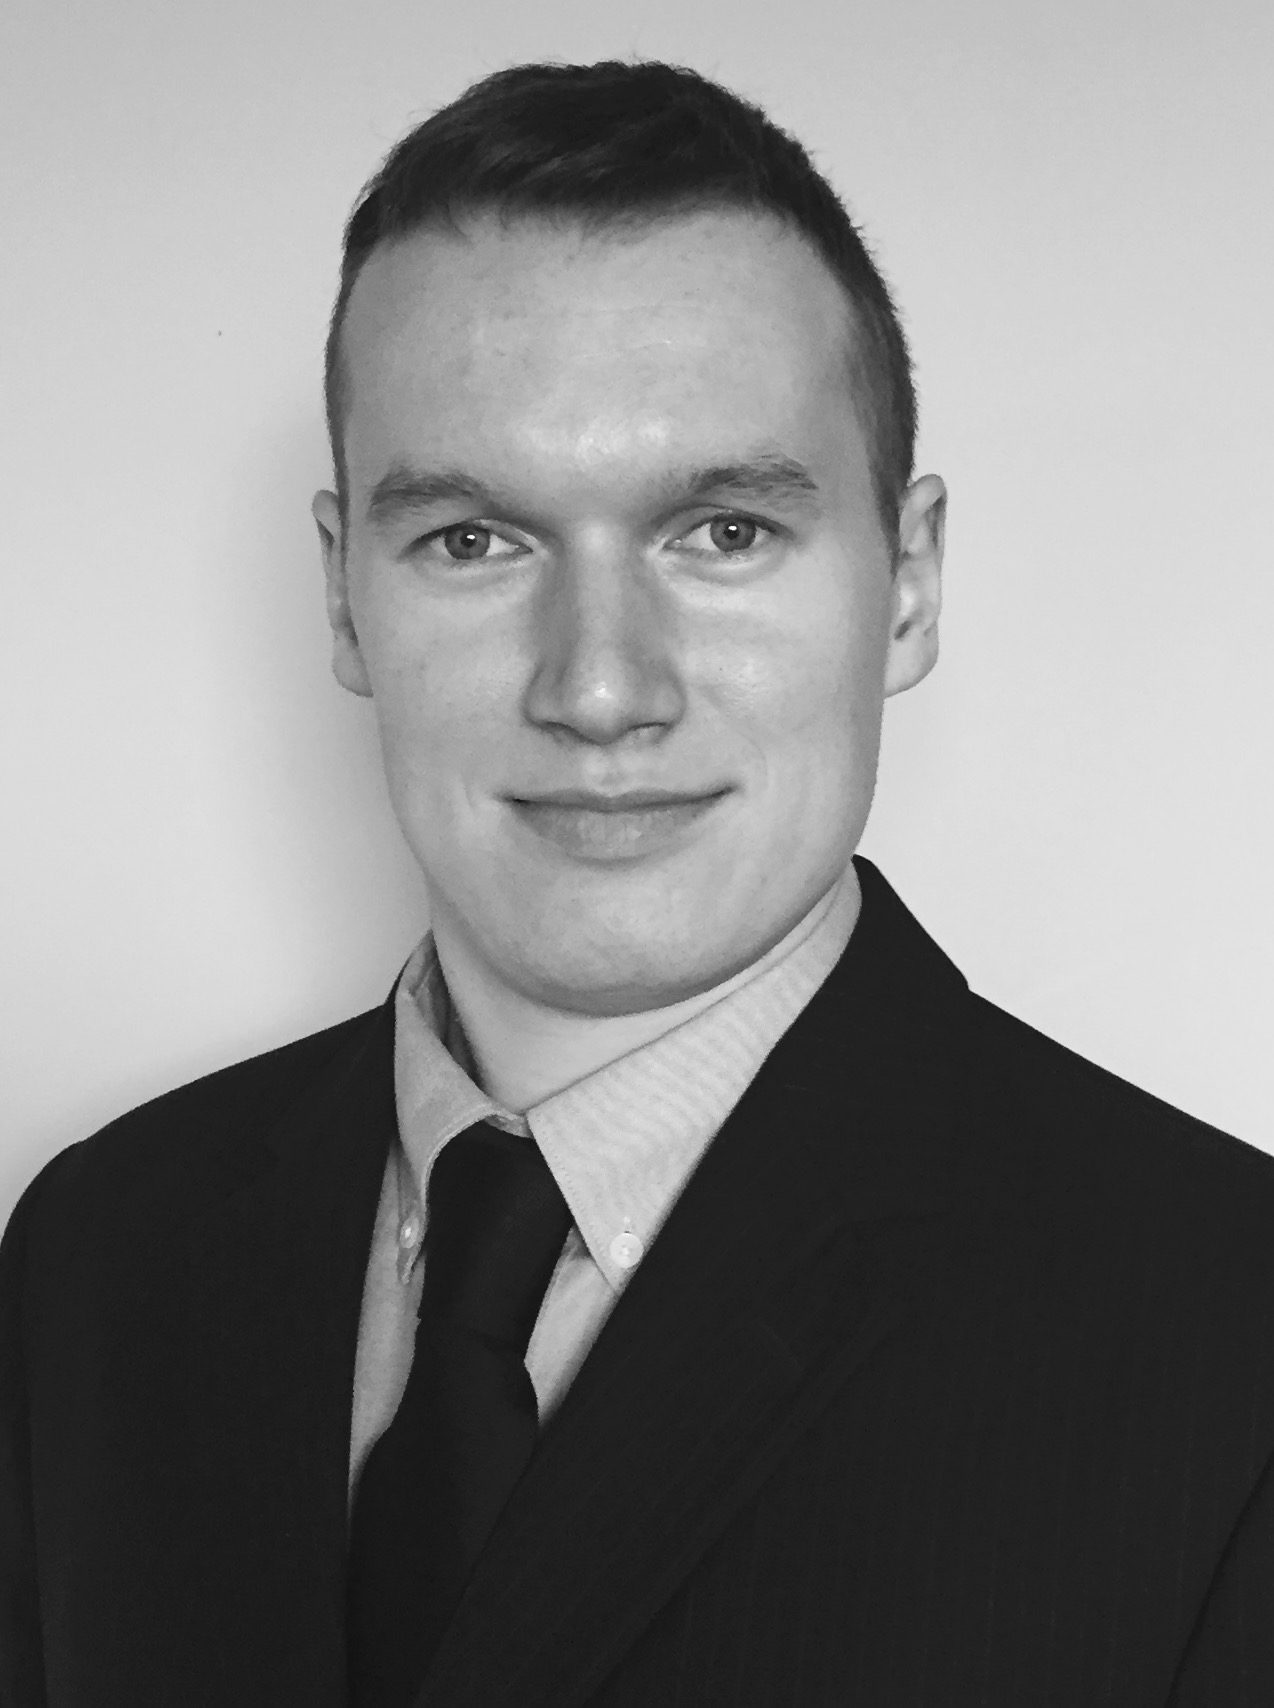 Eric Scholz